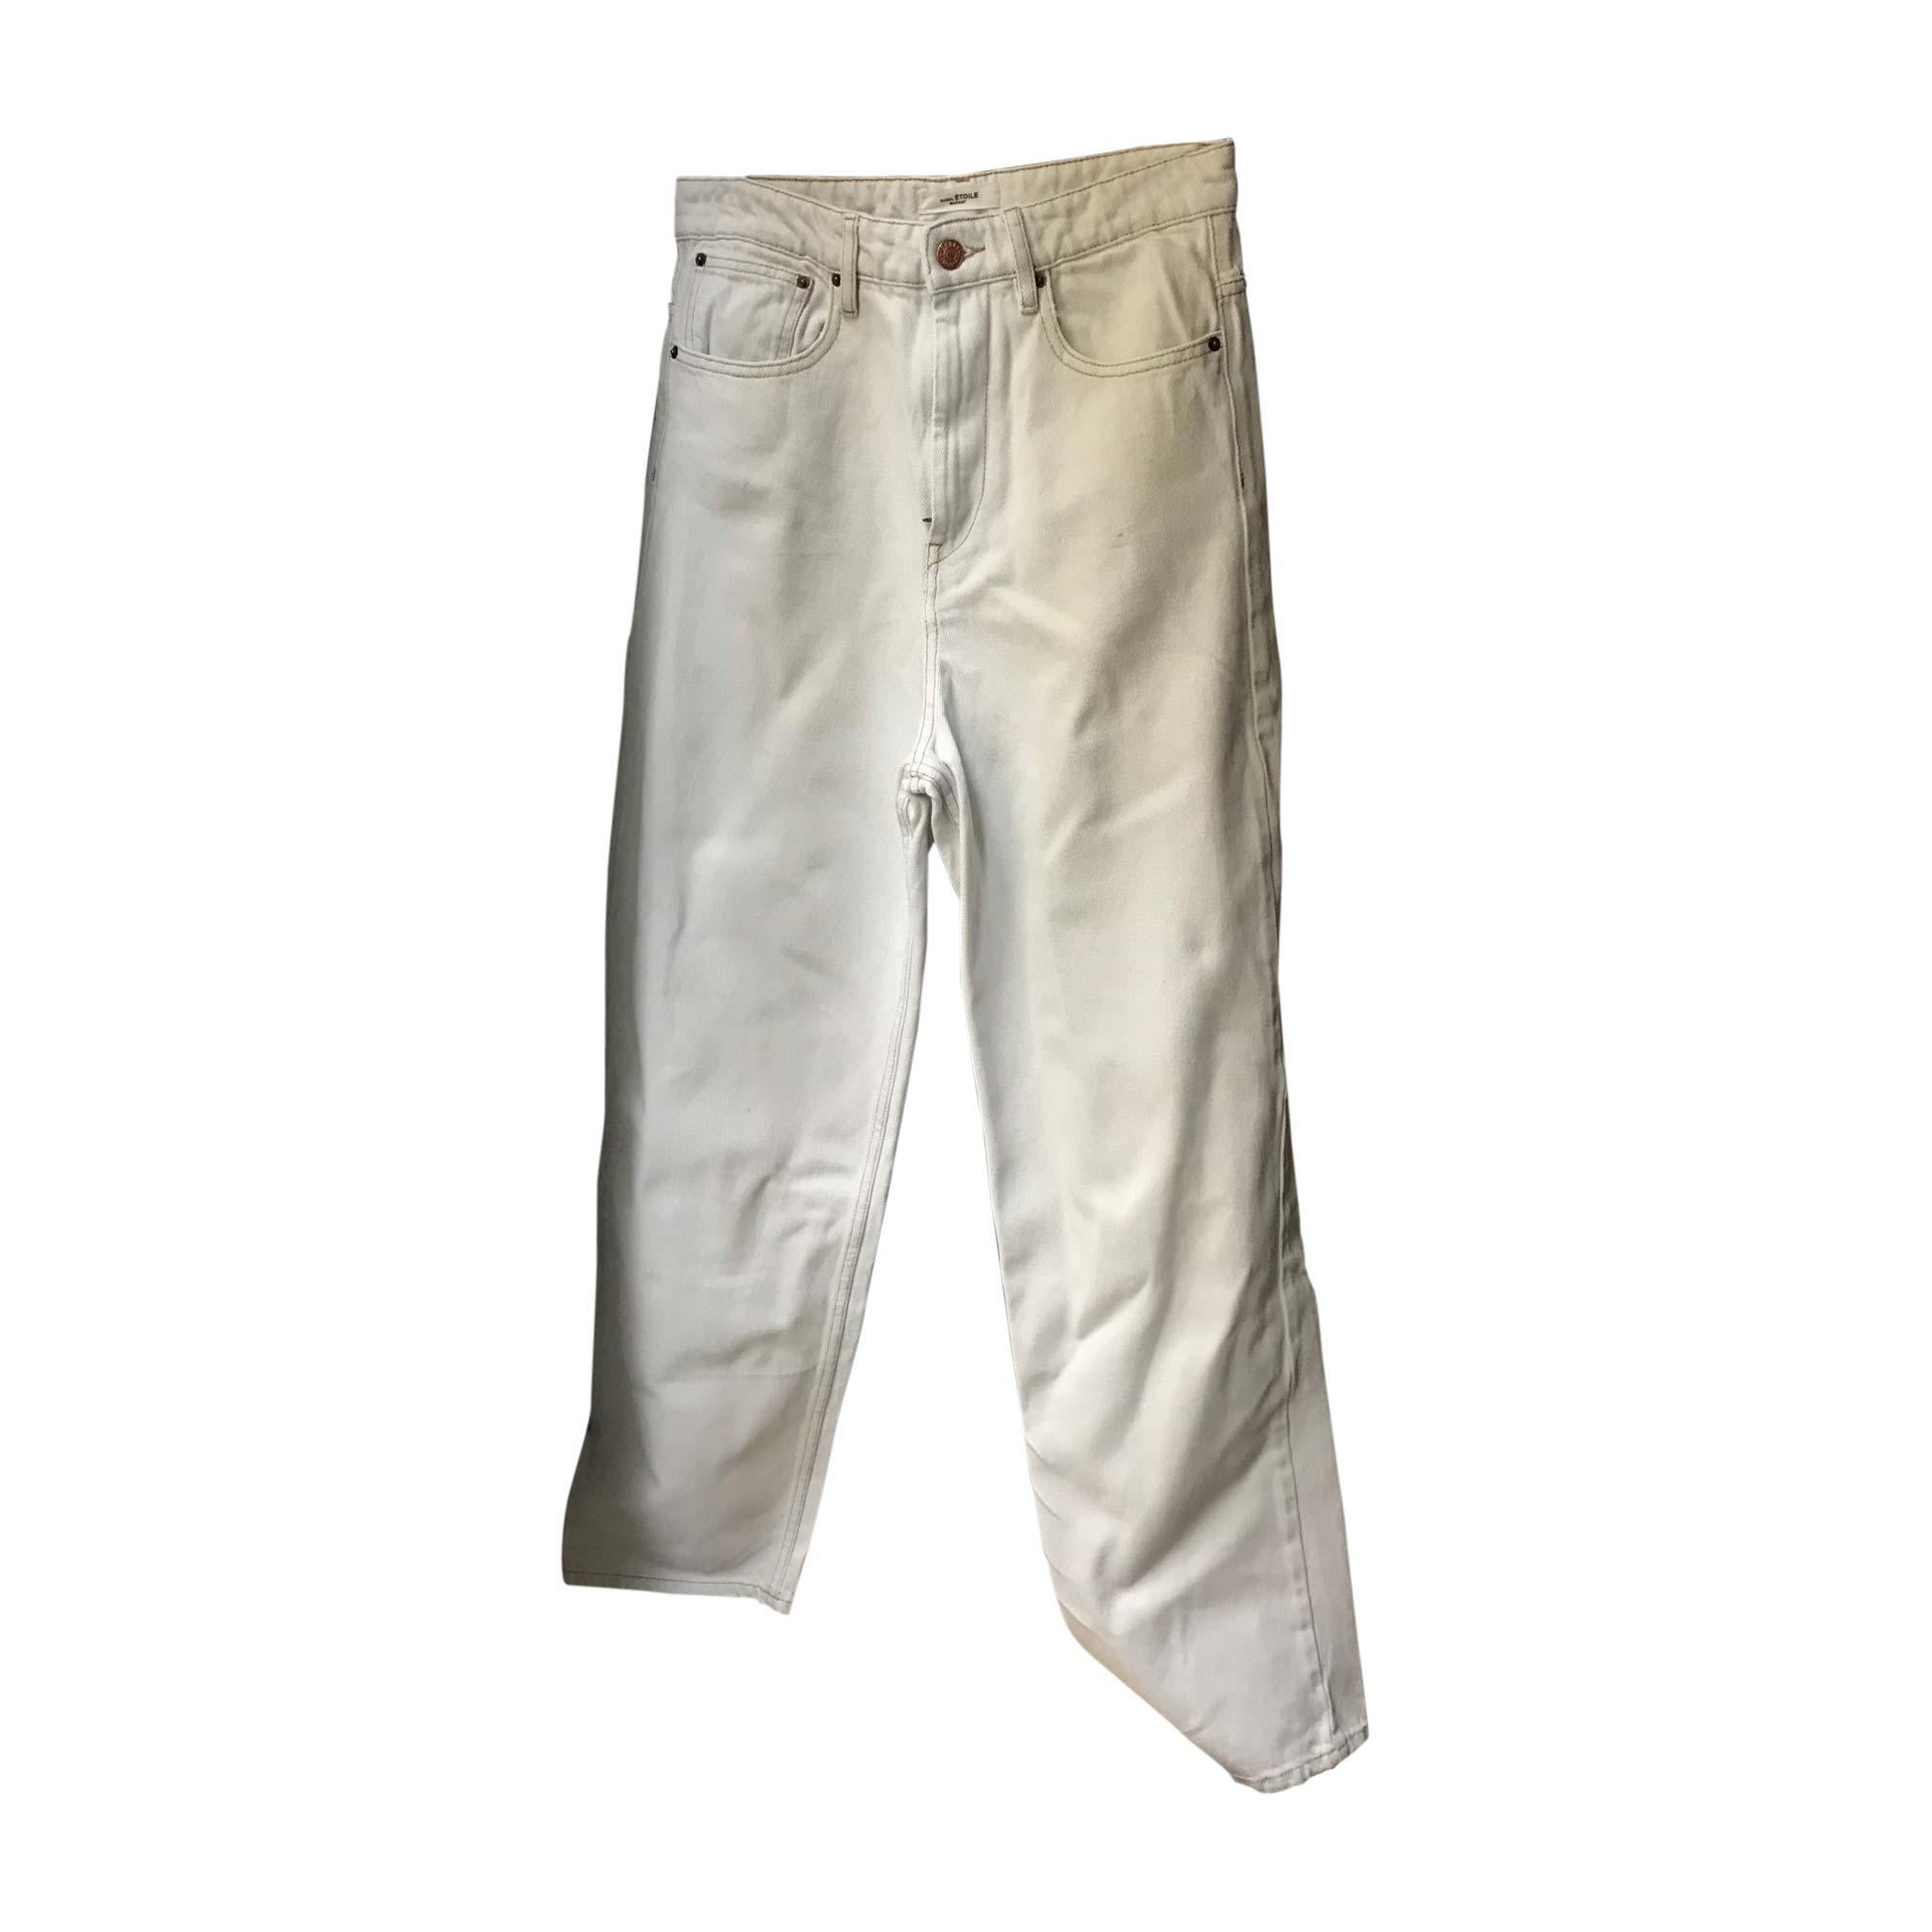 Pantalon droit ISABEL MARANT ETOILE Blanc, blanc cassé, écru